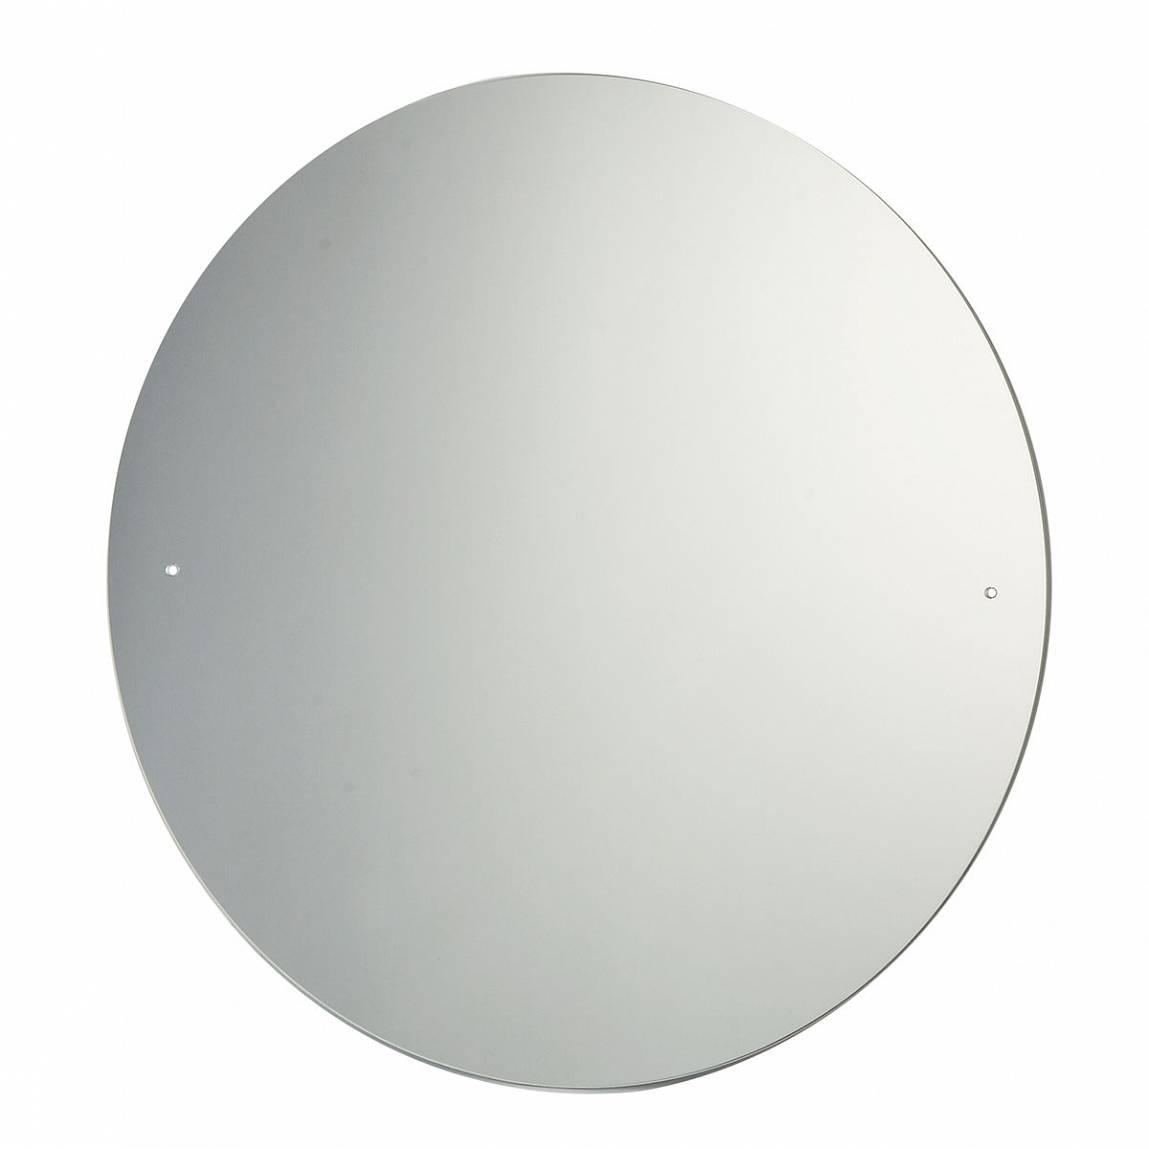 Image of Circular Drilled Mirror Diameter 40cm